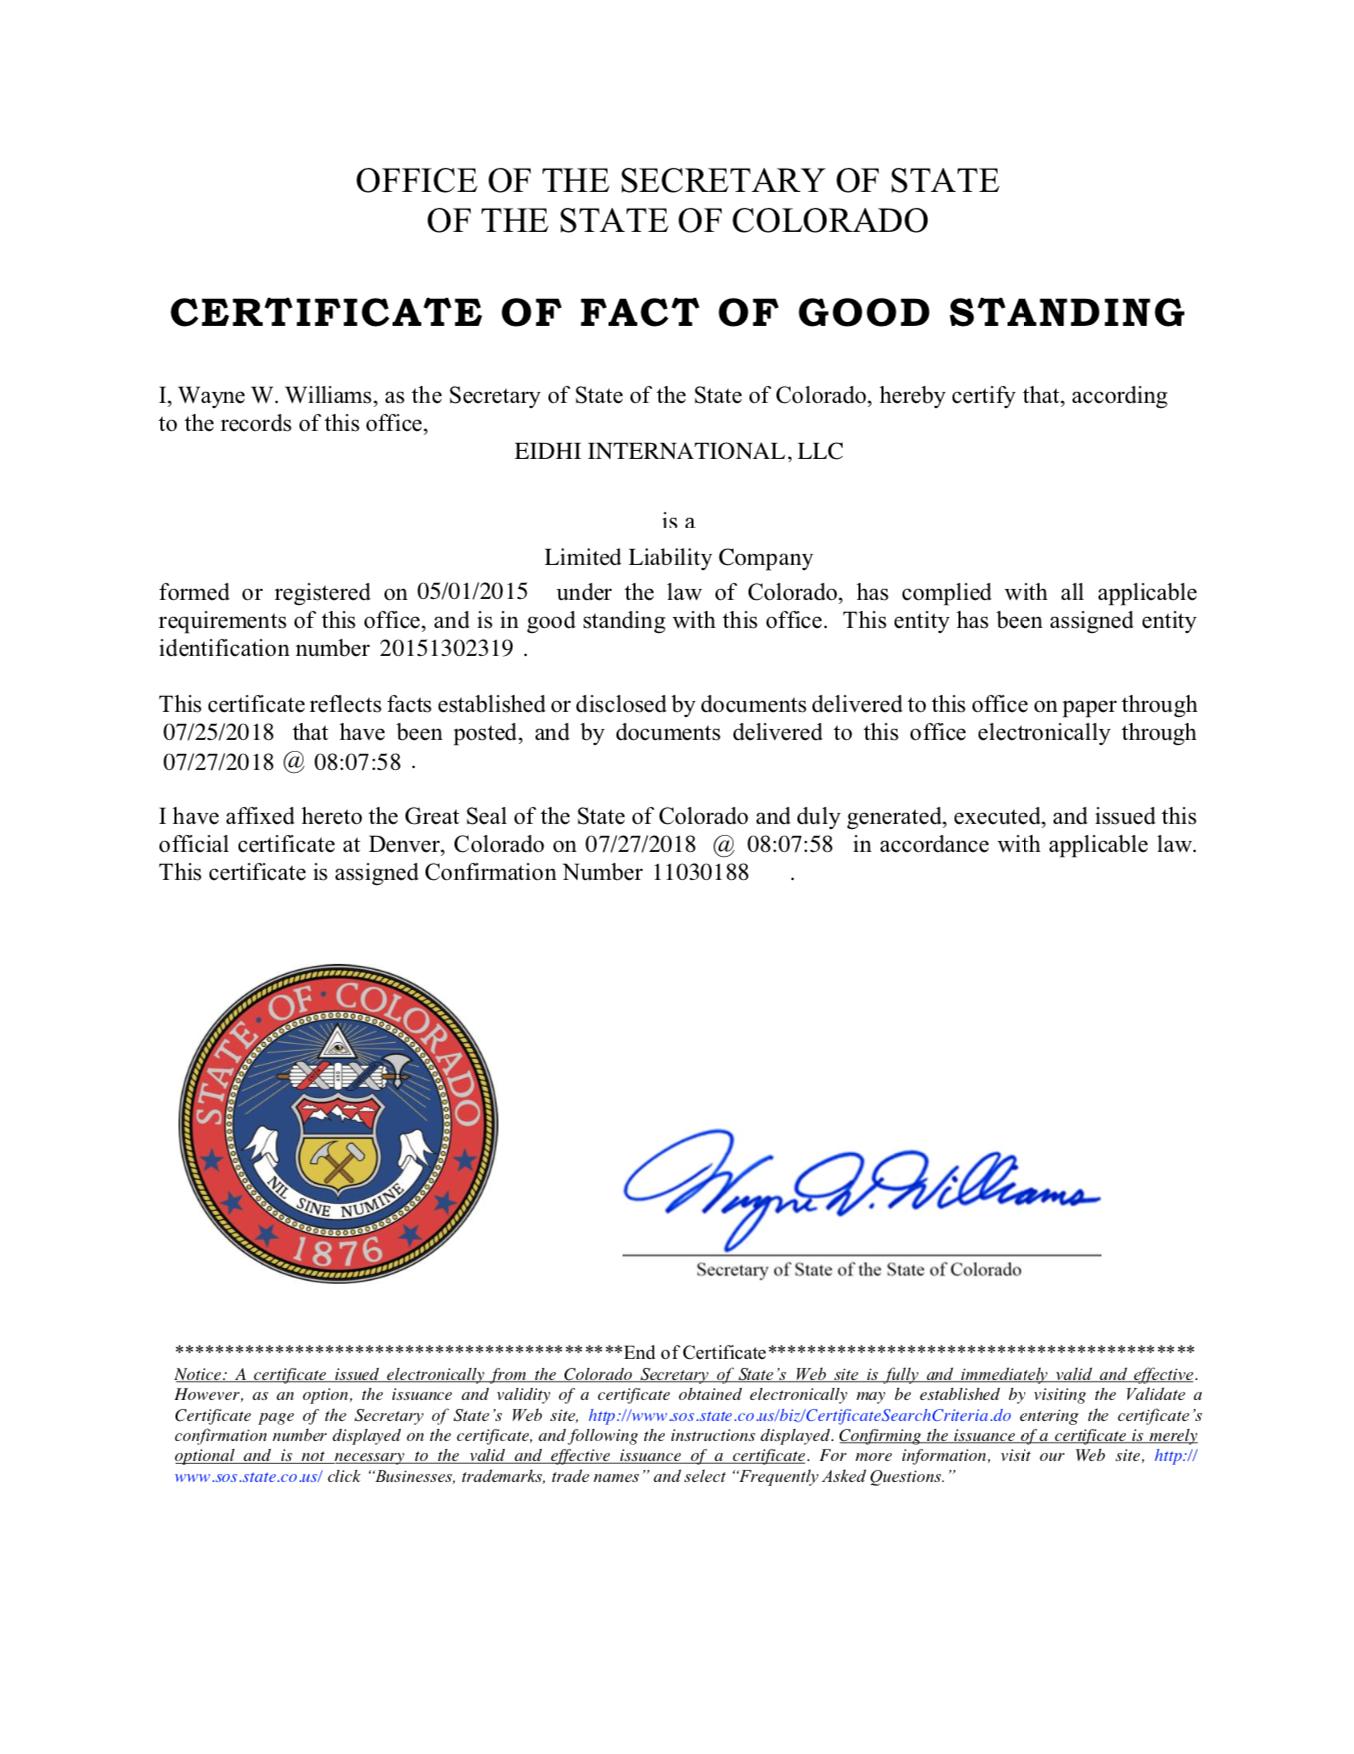 certificate-of-fact-of-good-standing-eidhi-university-2018